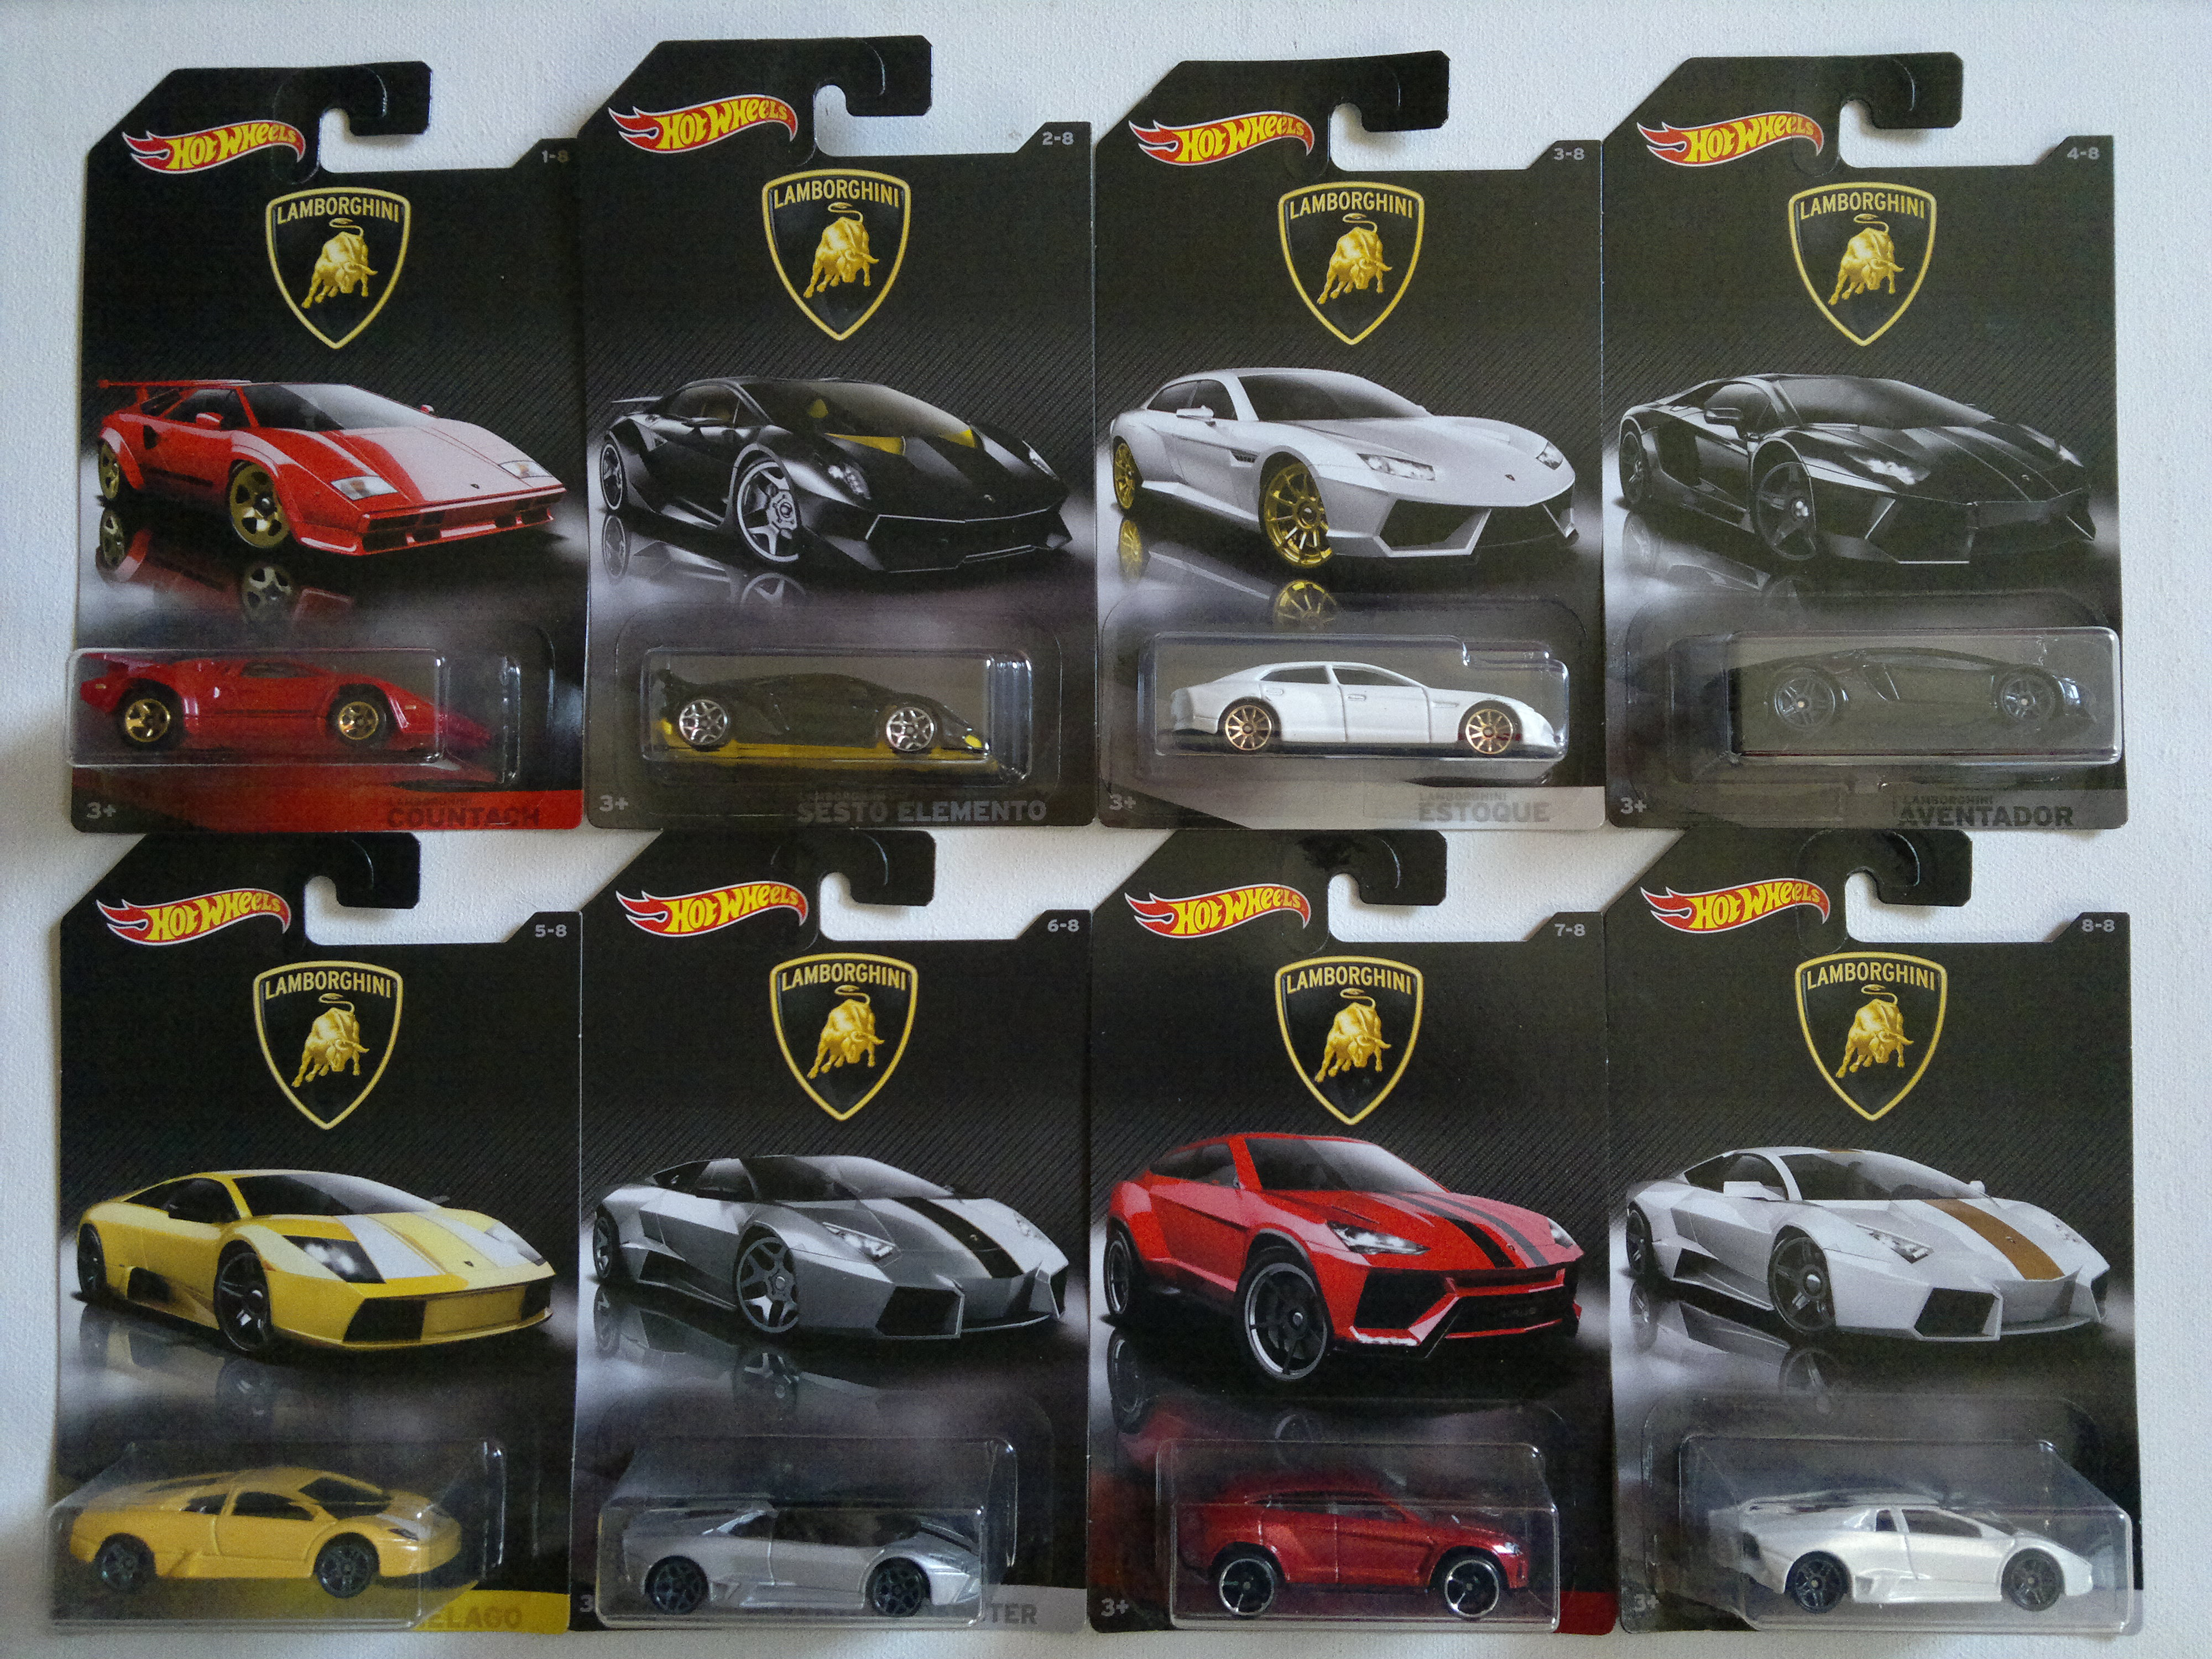 Lamborghini Series (2017)